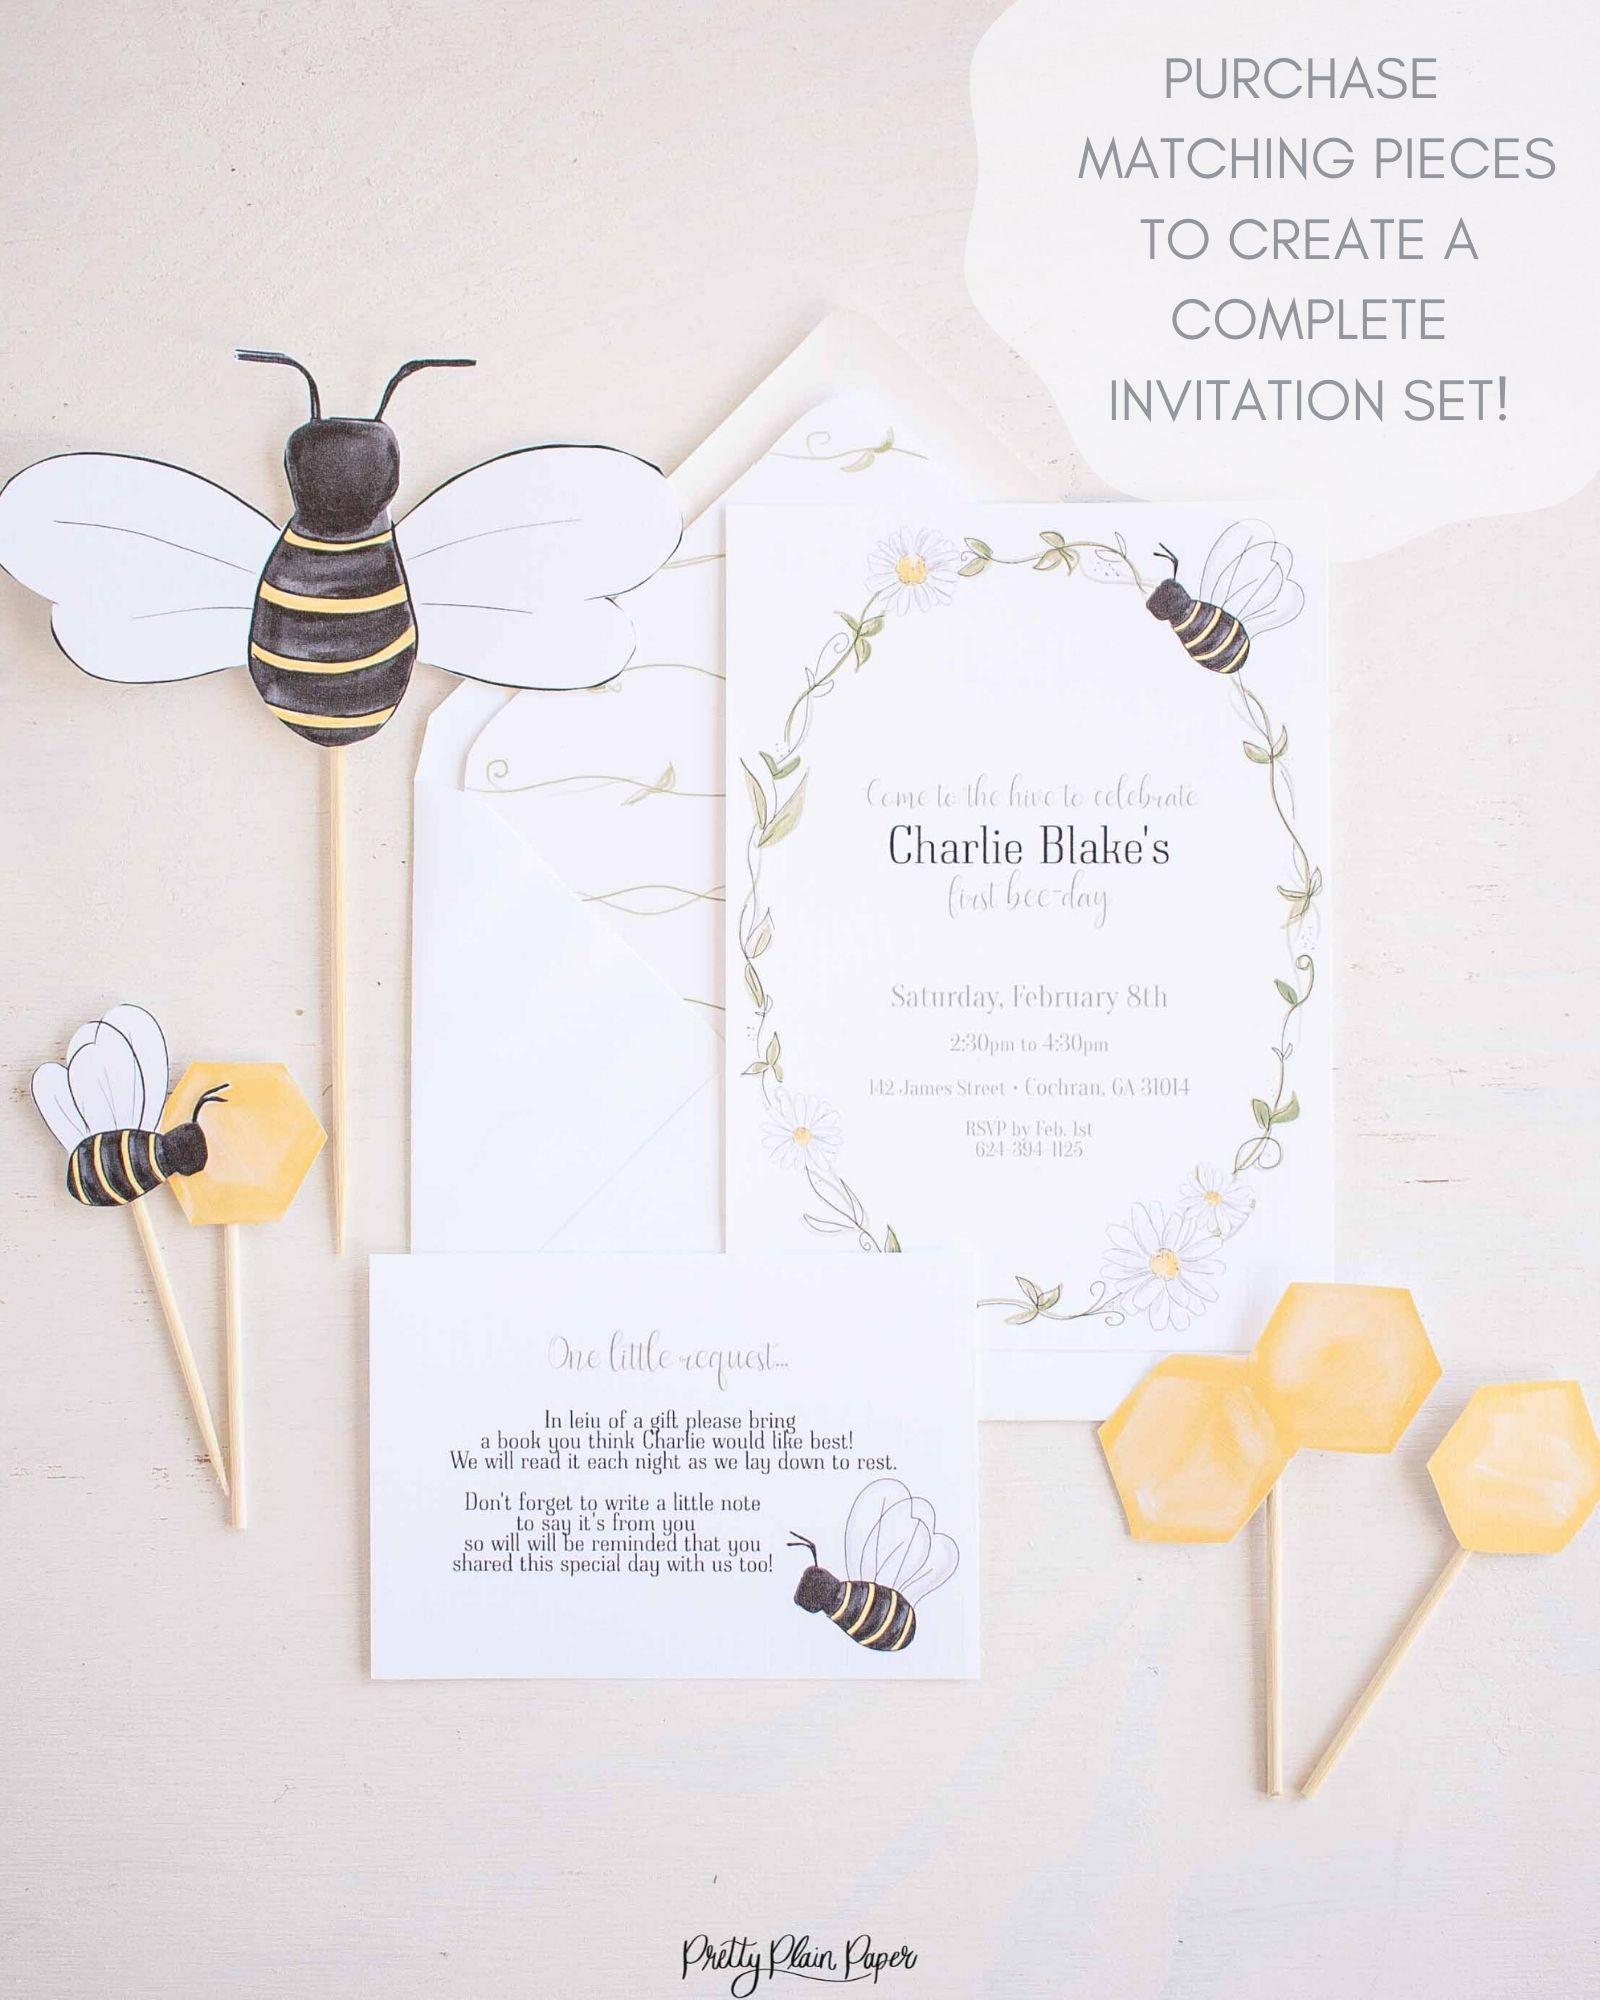 Bee Party - Invitation - Pretty Plain Paper [ 2000 x 1600 Pixel ]